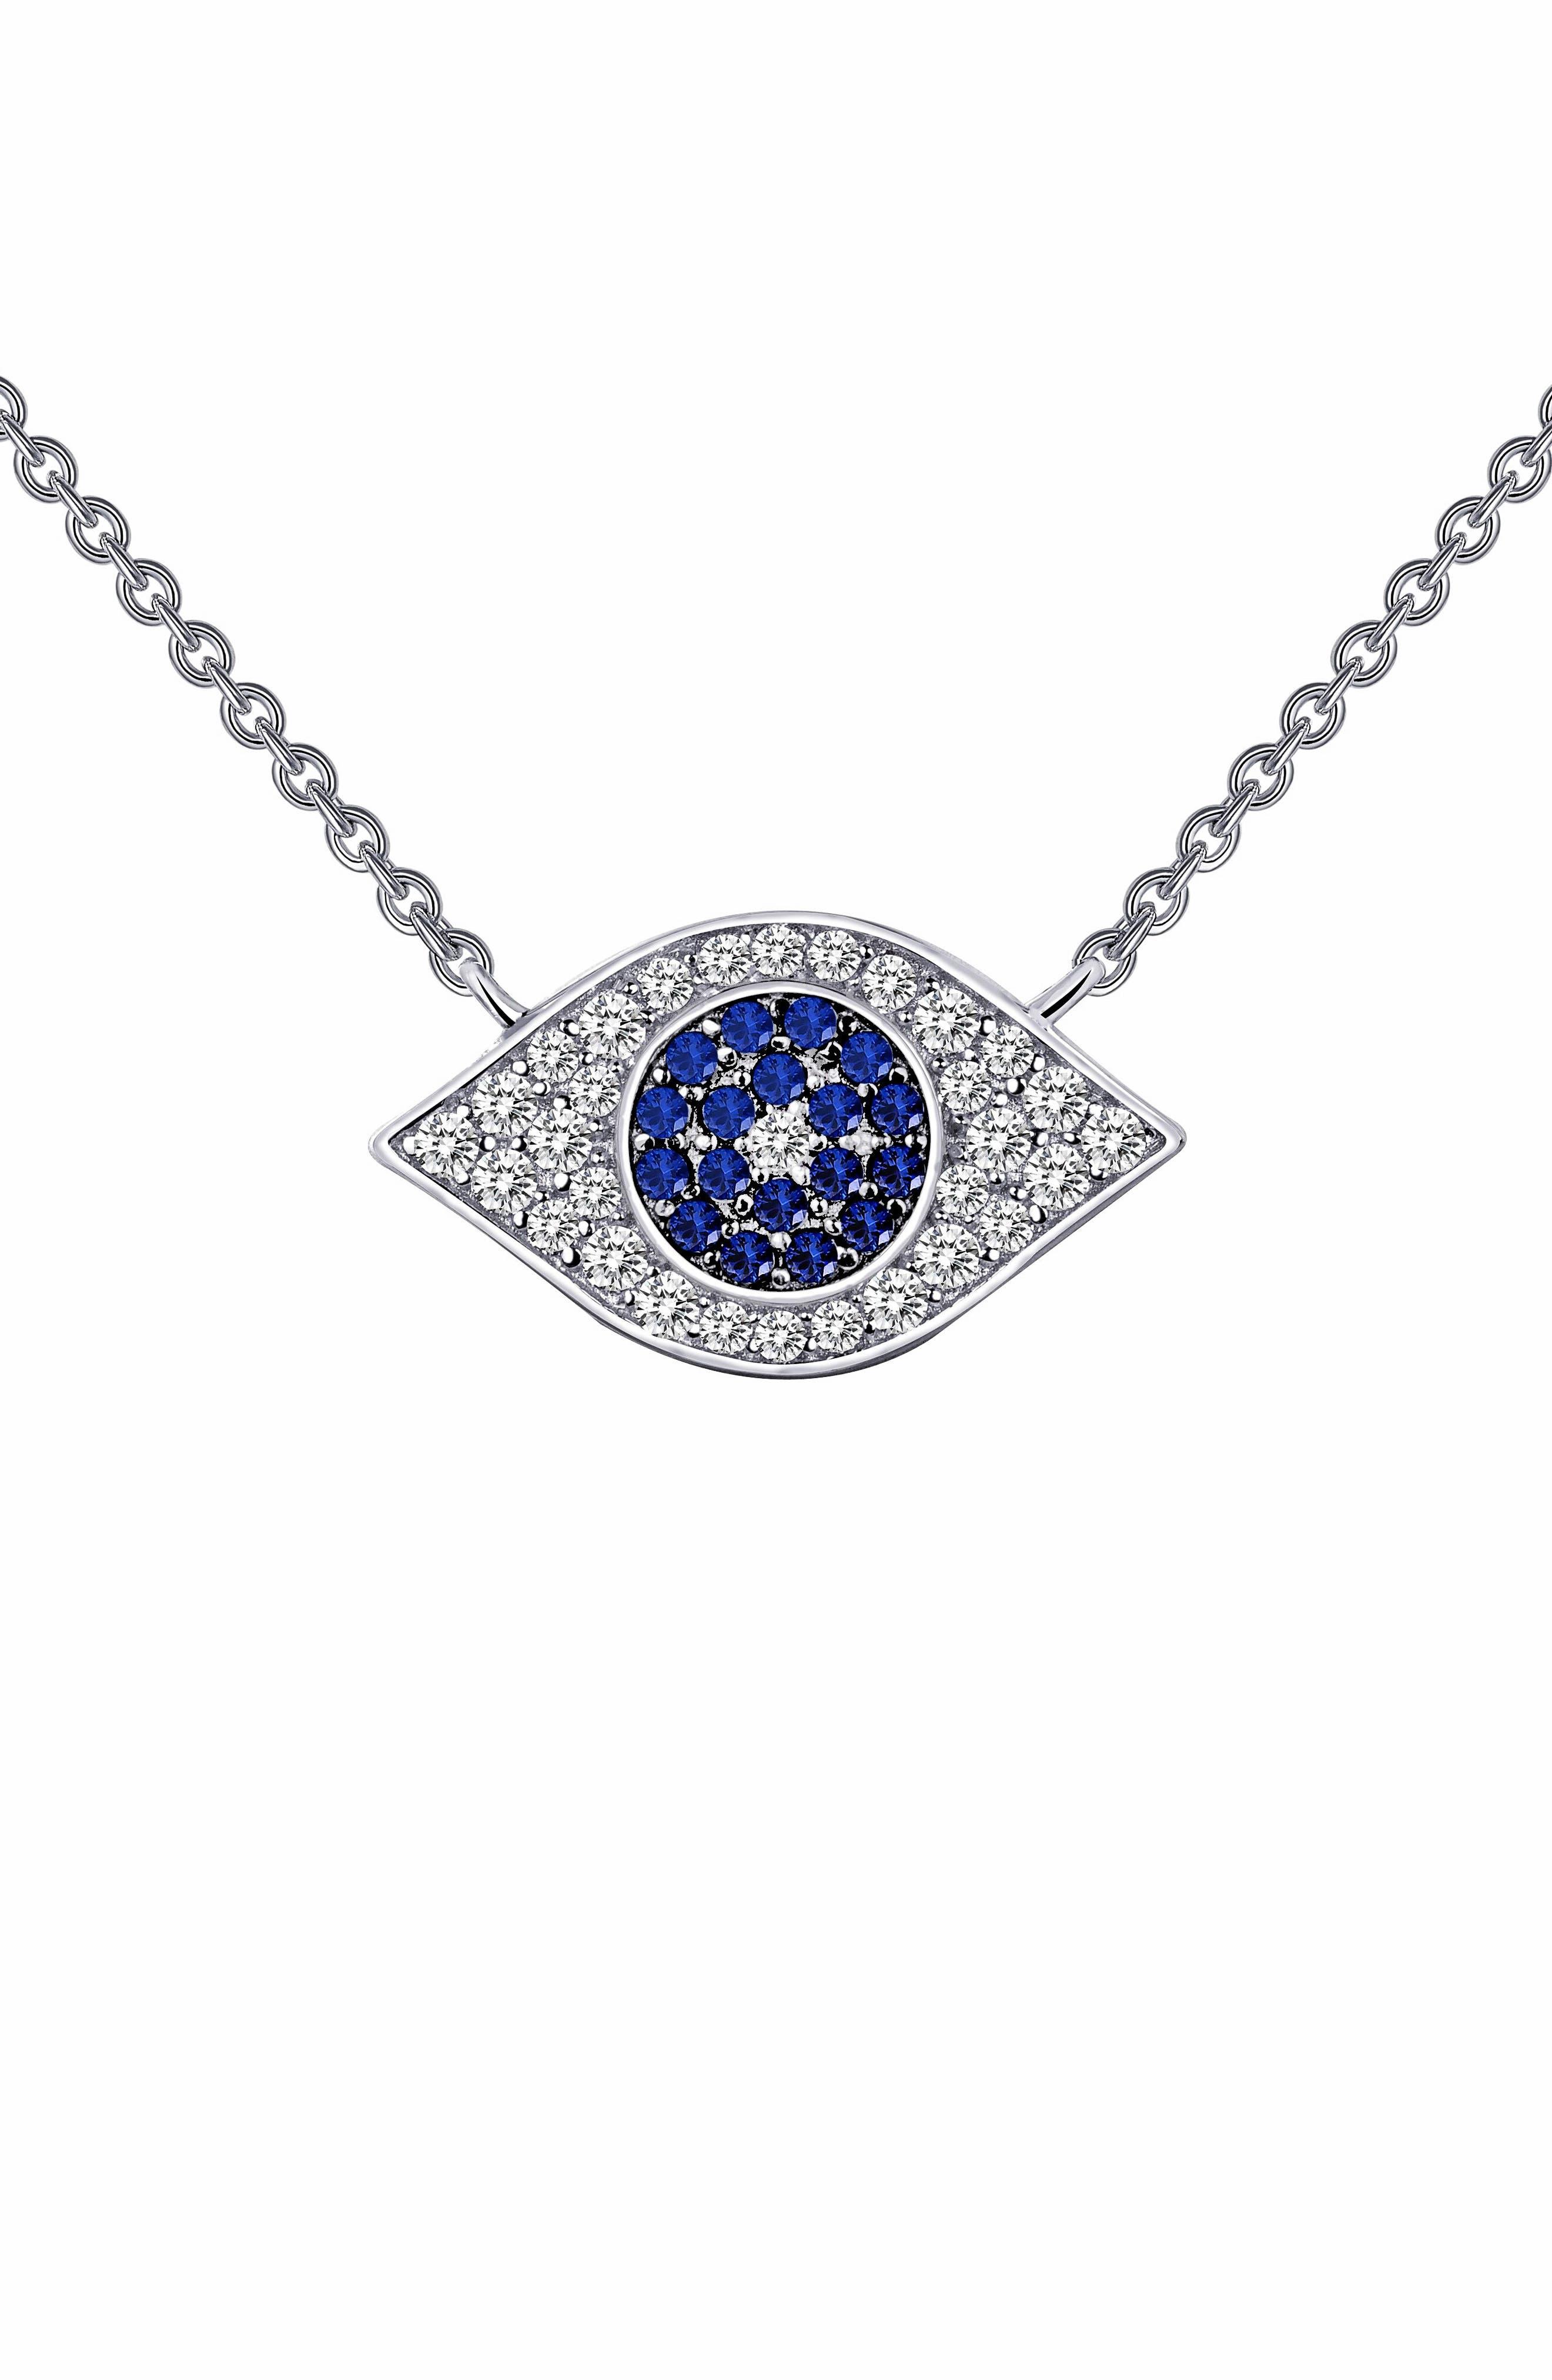 Simulated Diamond Amulet Pendant Necklace,                         Main,                         color, Sapphire / Silver